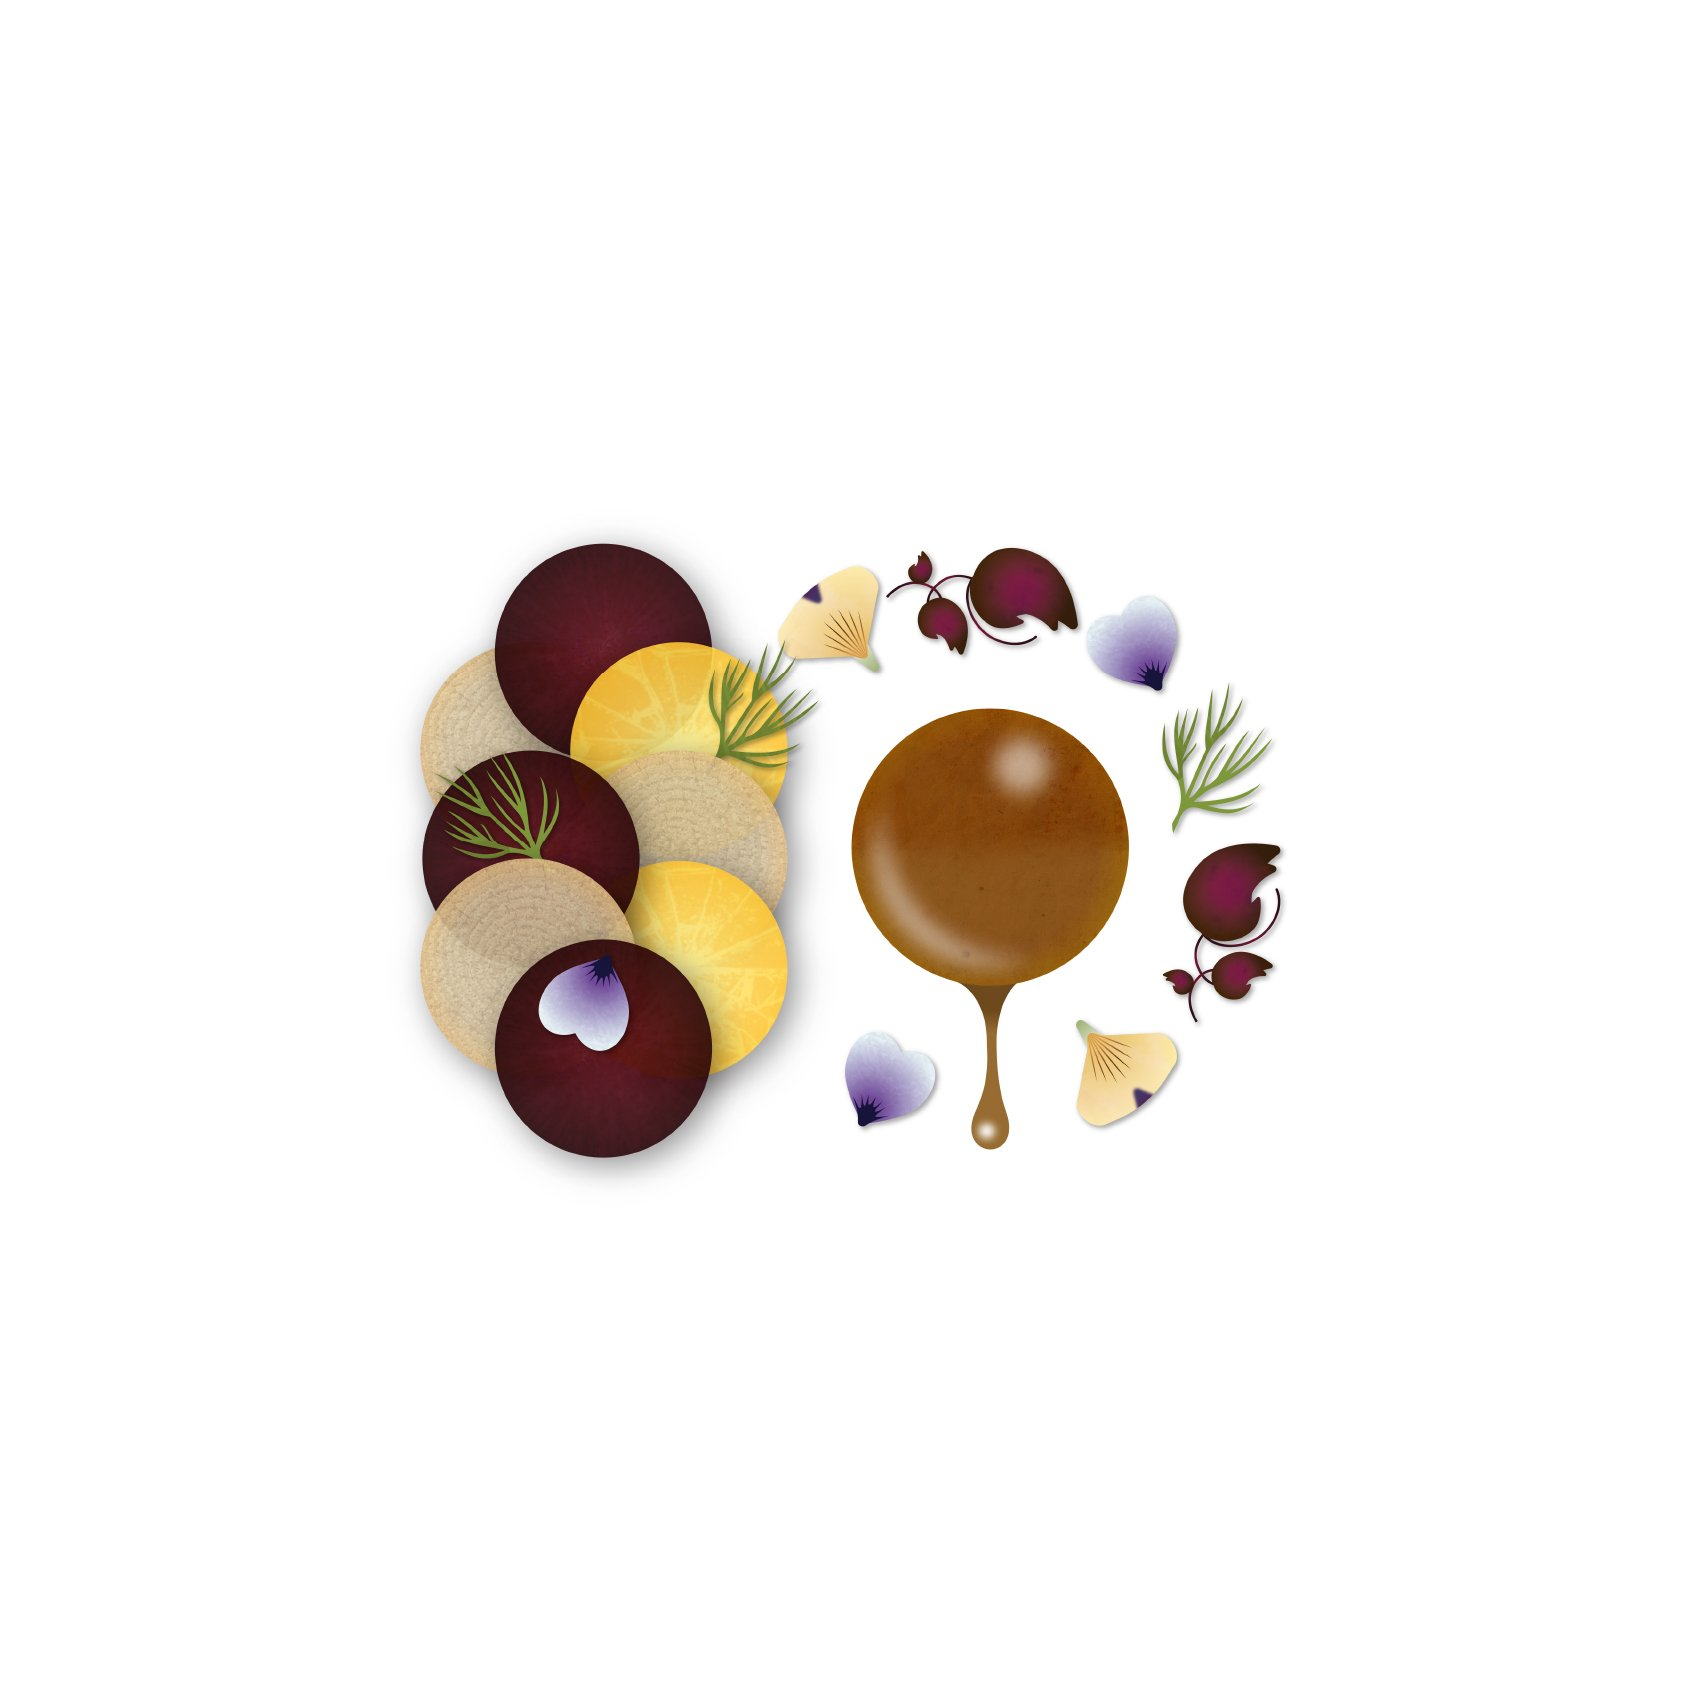 Sublime food design ricette in cibografica 35